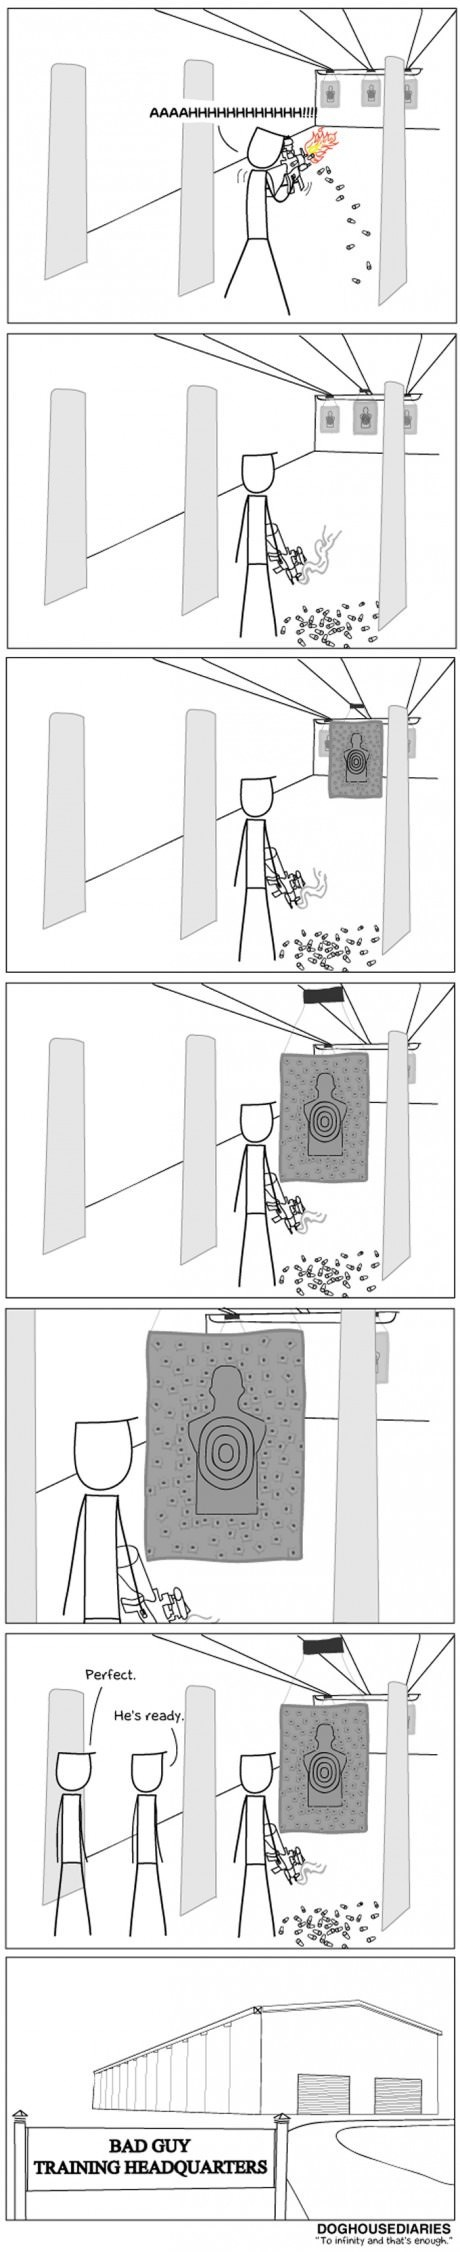 guns bad guys sad but true web comics - 8003580928